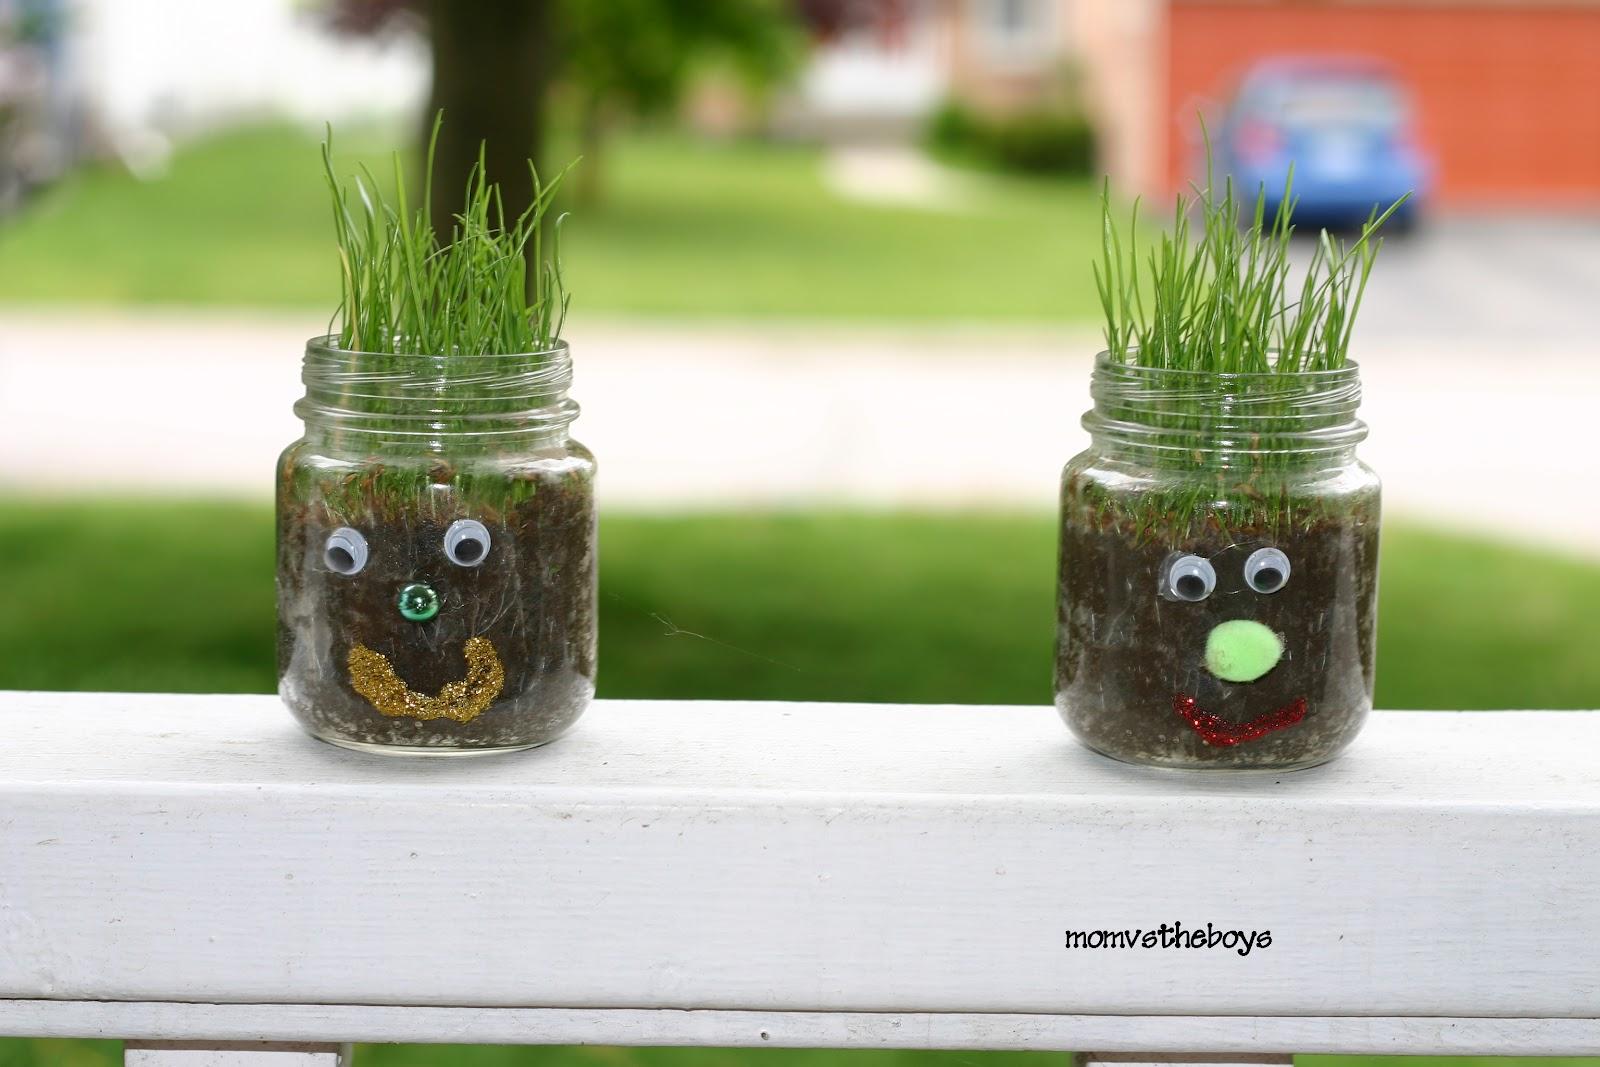 Meet Hairy! A Spring Gardening Craft For Kids